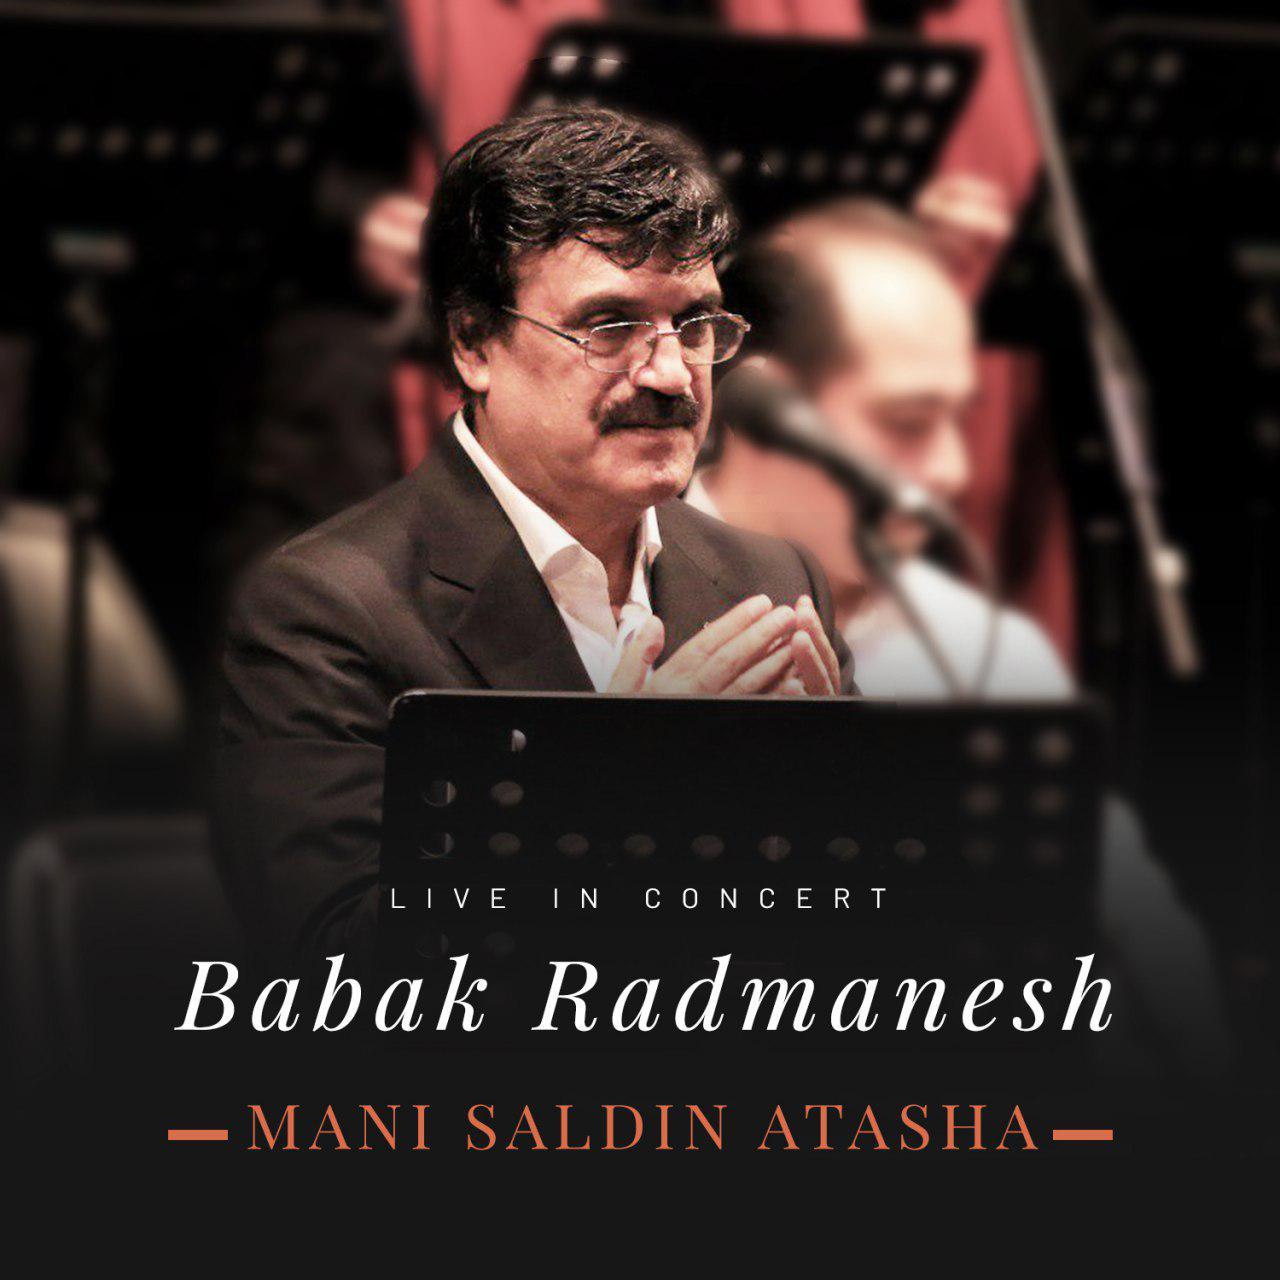 http://s8.picofile.com/file/8368086526/04Babak_Radmanesh_Mani_Saldin_Atasha_Live_In_Concert_.jpg